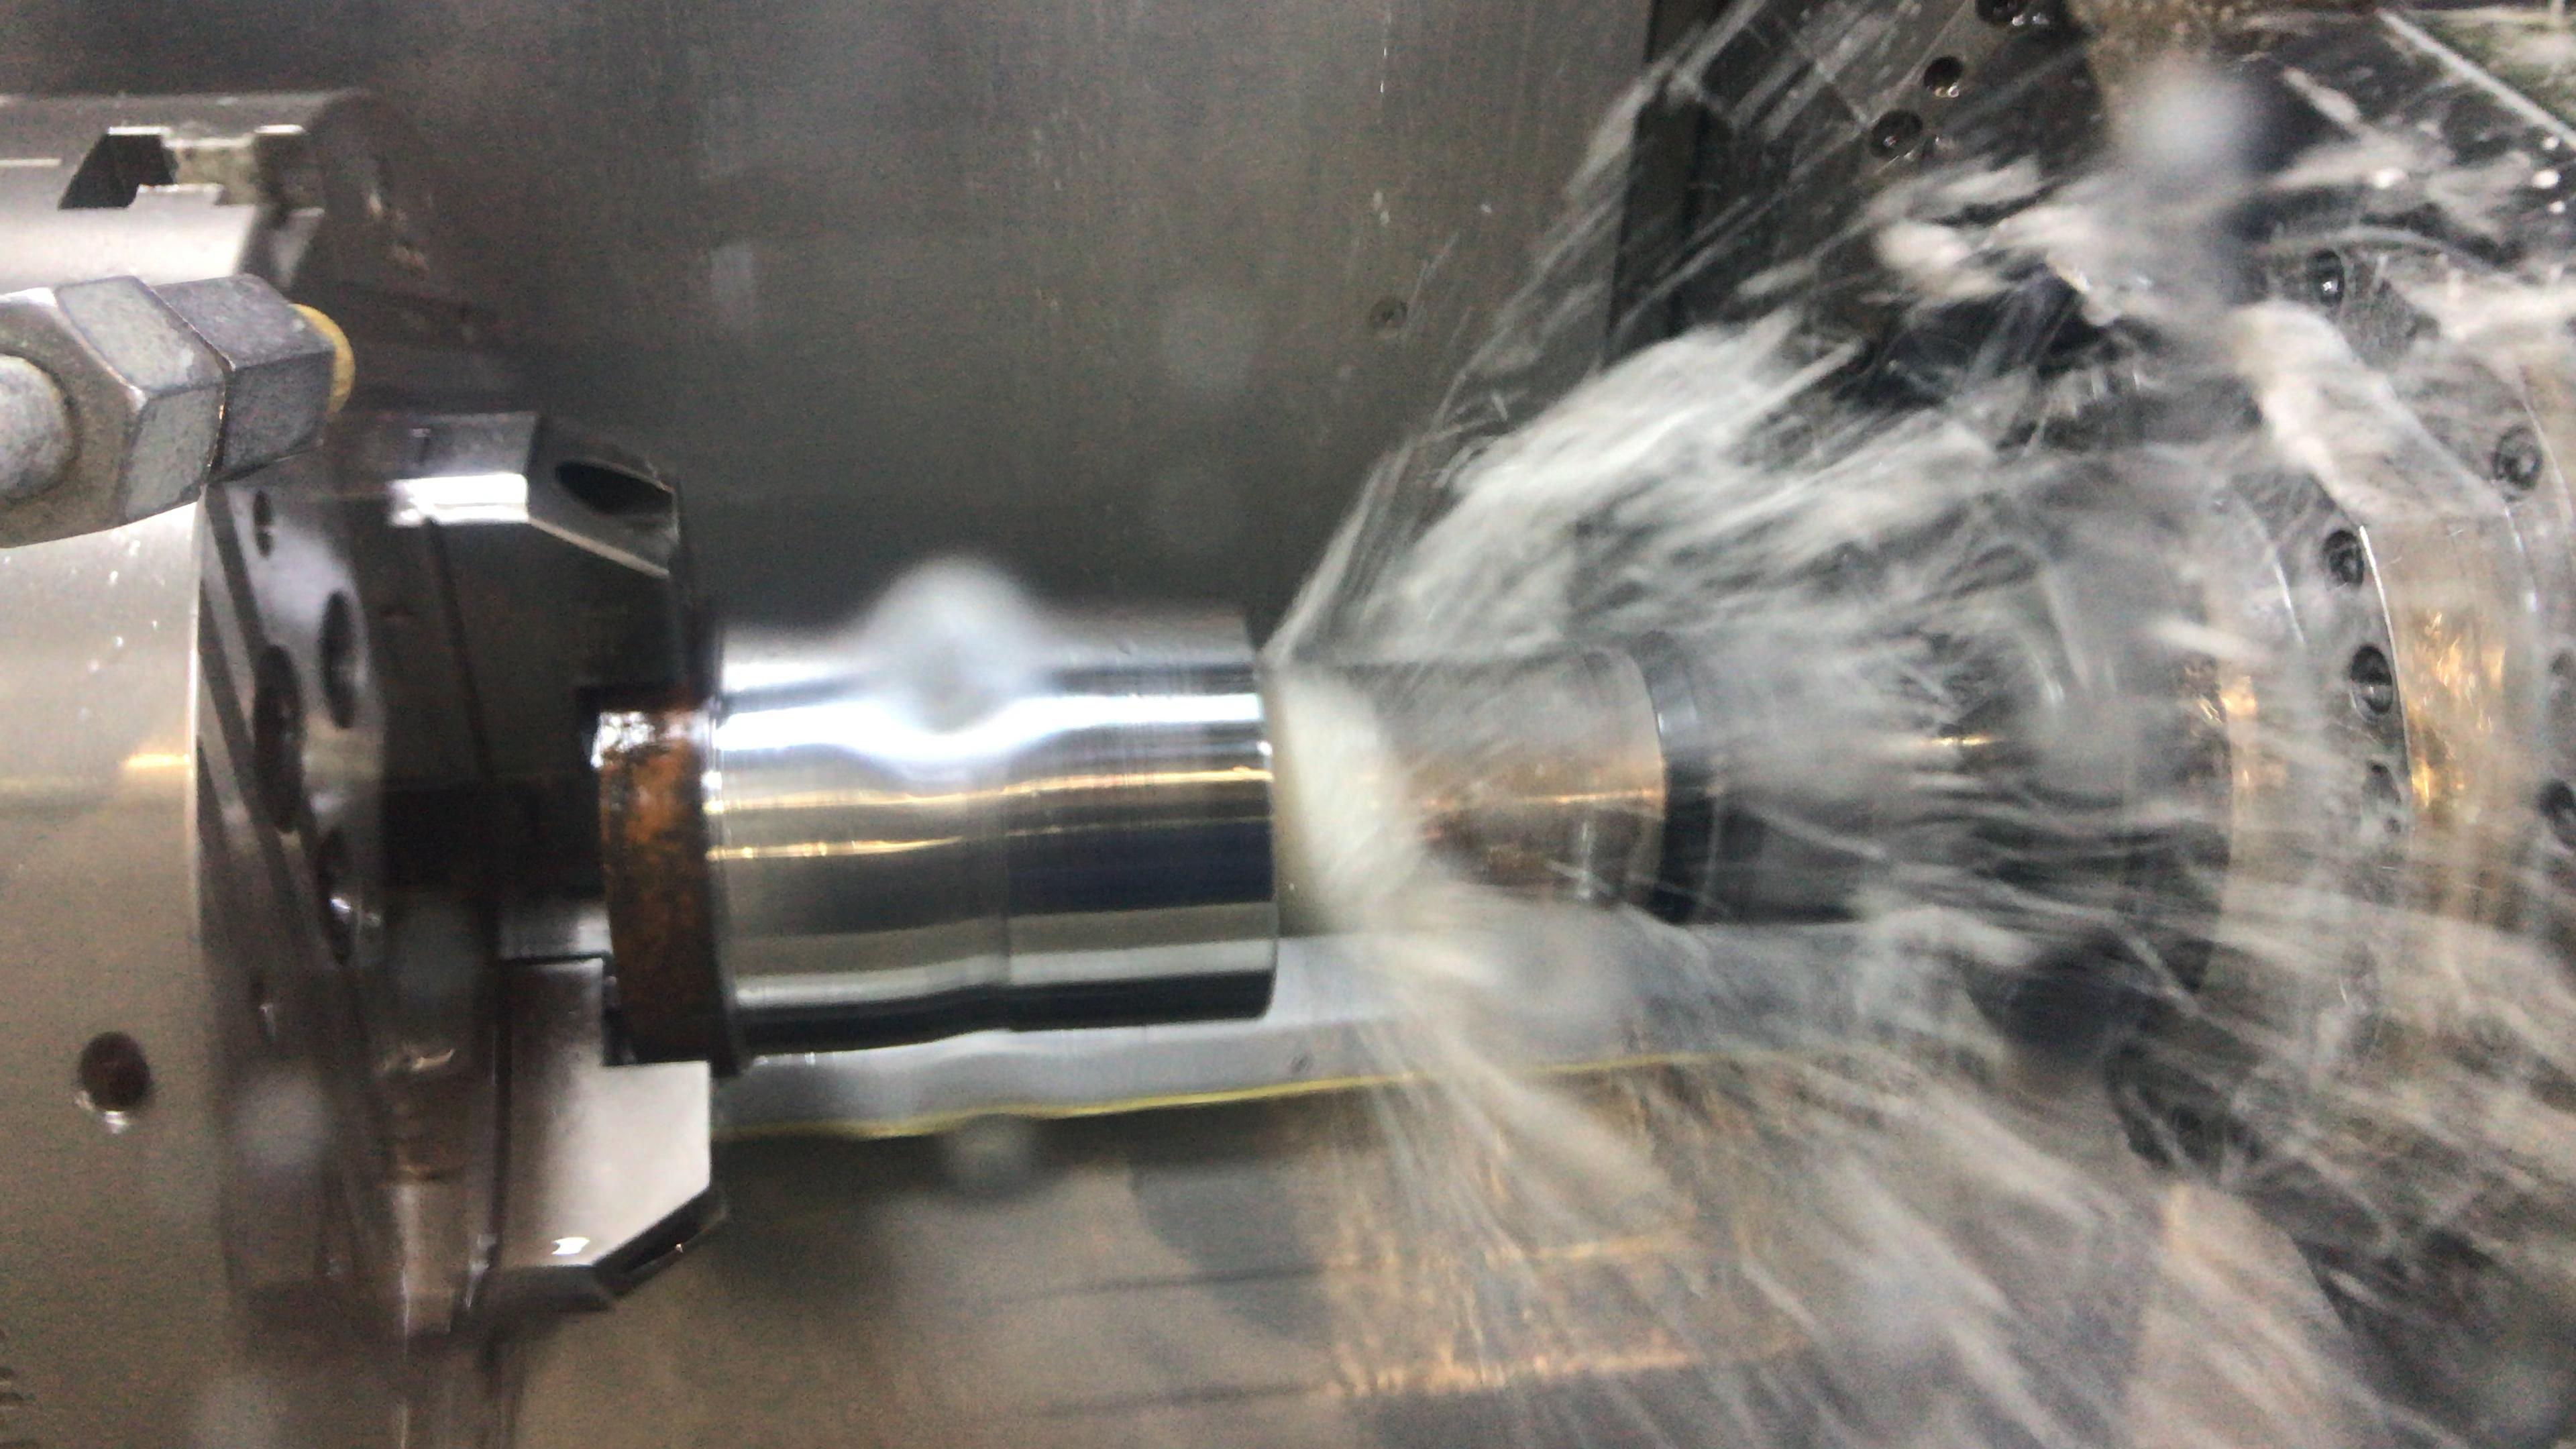 Sandvik 2 5 880 drill rotating on B axis DMG CTX Beta 1250